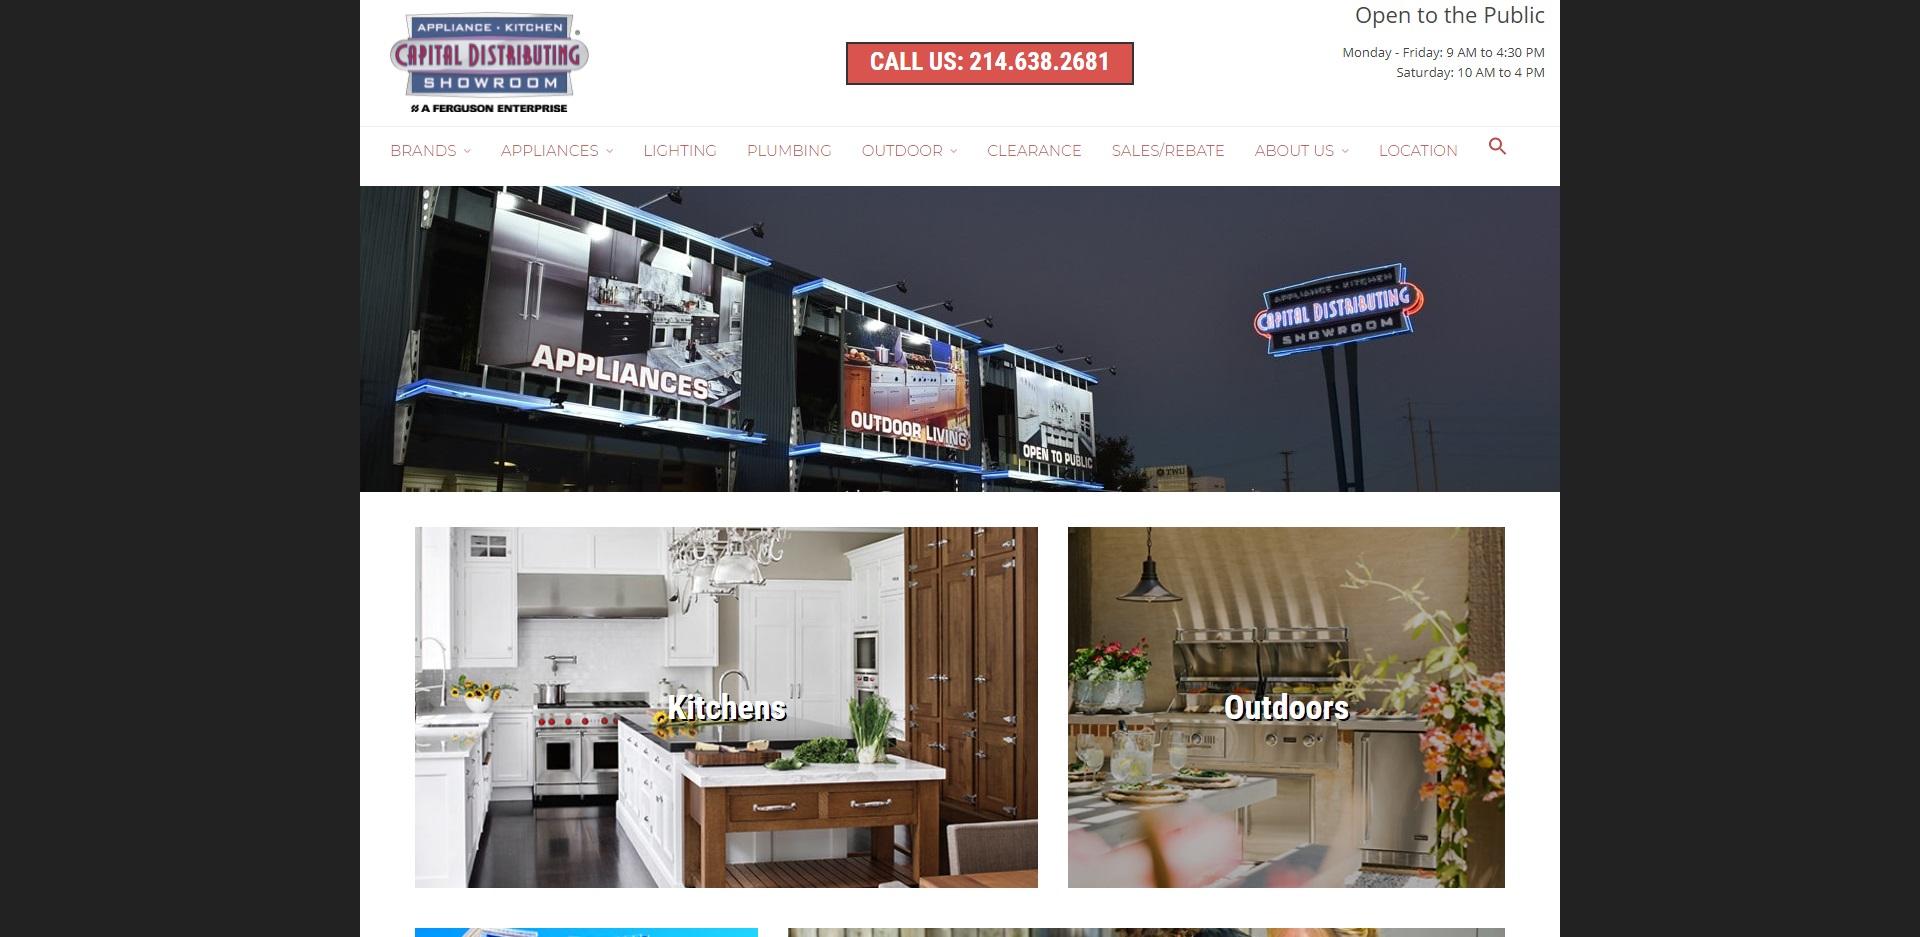 5 Best Whitegoods Stores in Dallas, TX